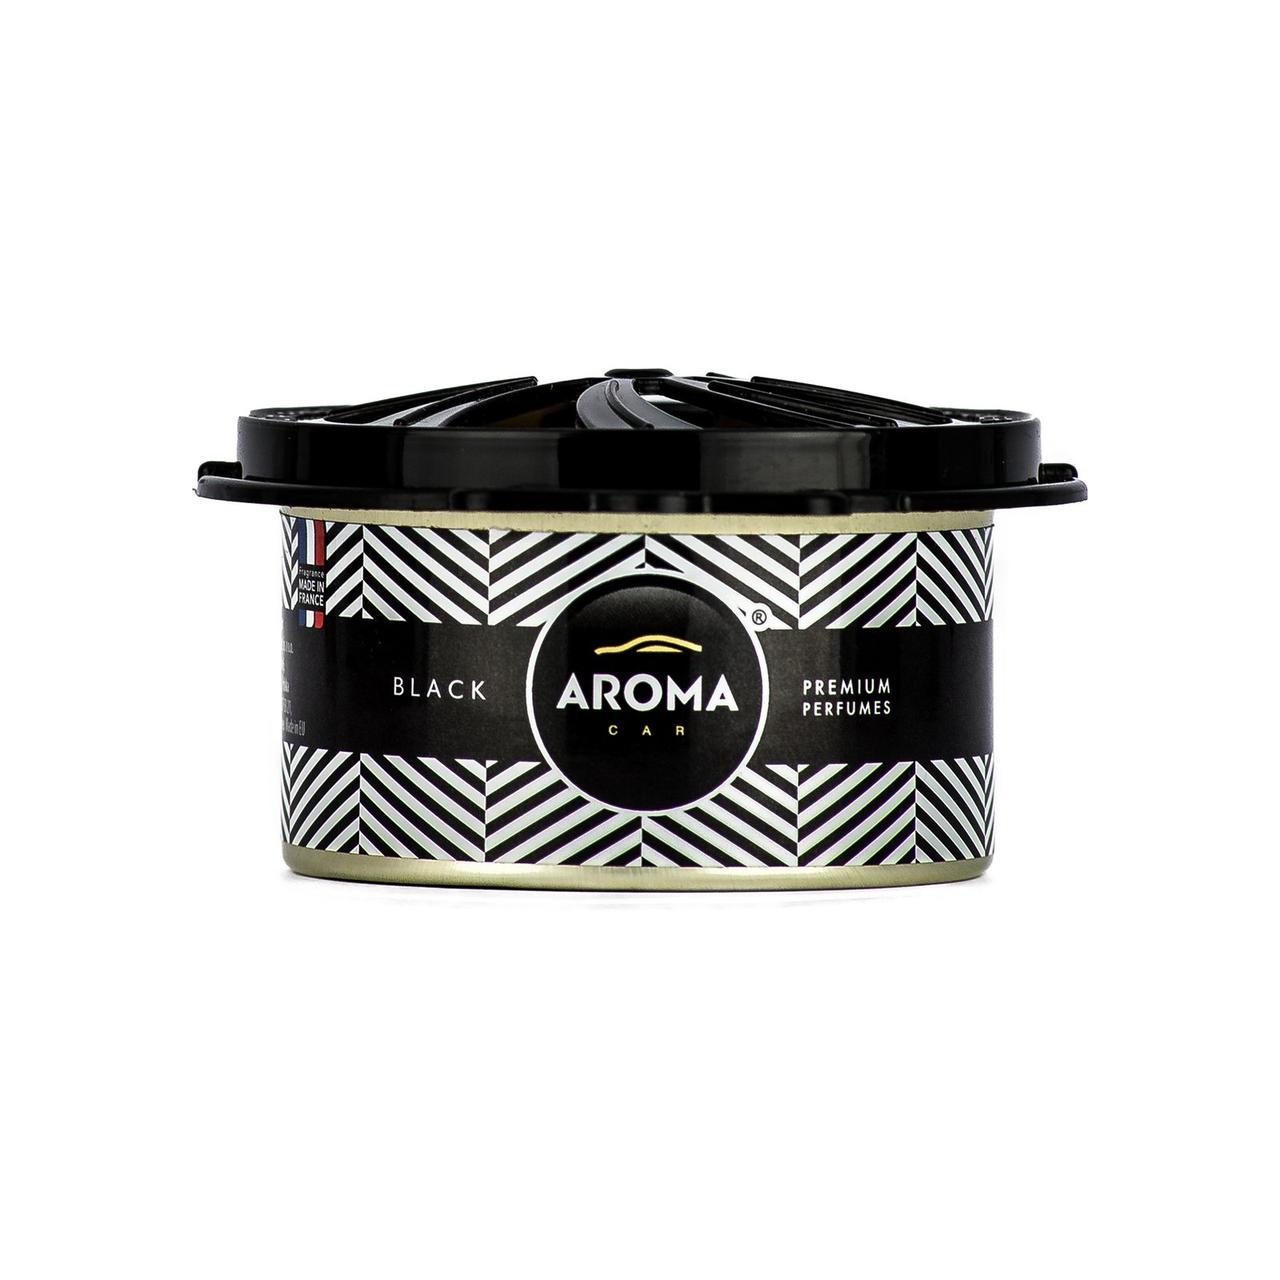 Ароматизатор под сидение сухой Prestige Organic Black, Aroma